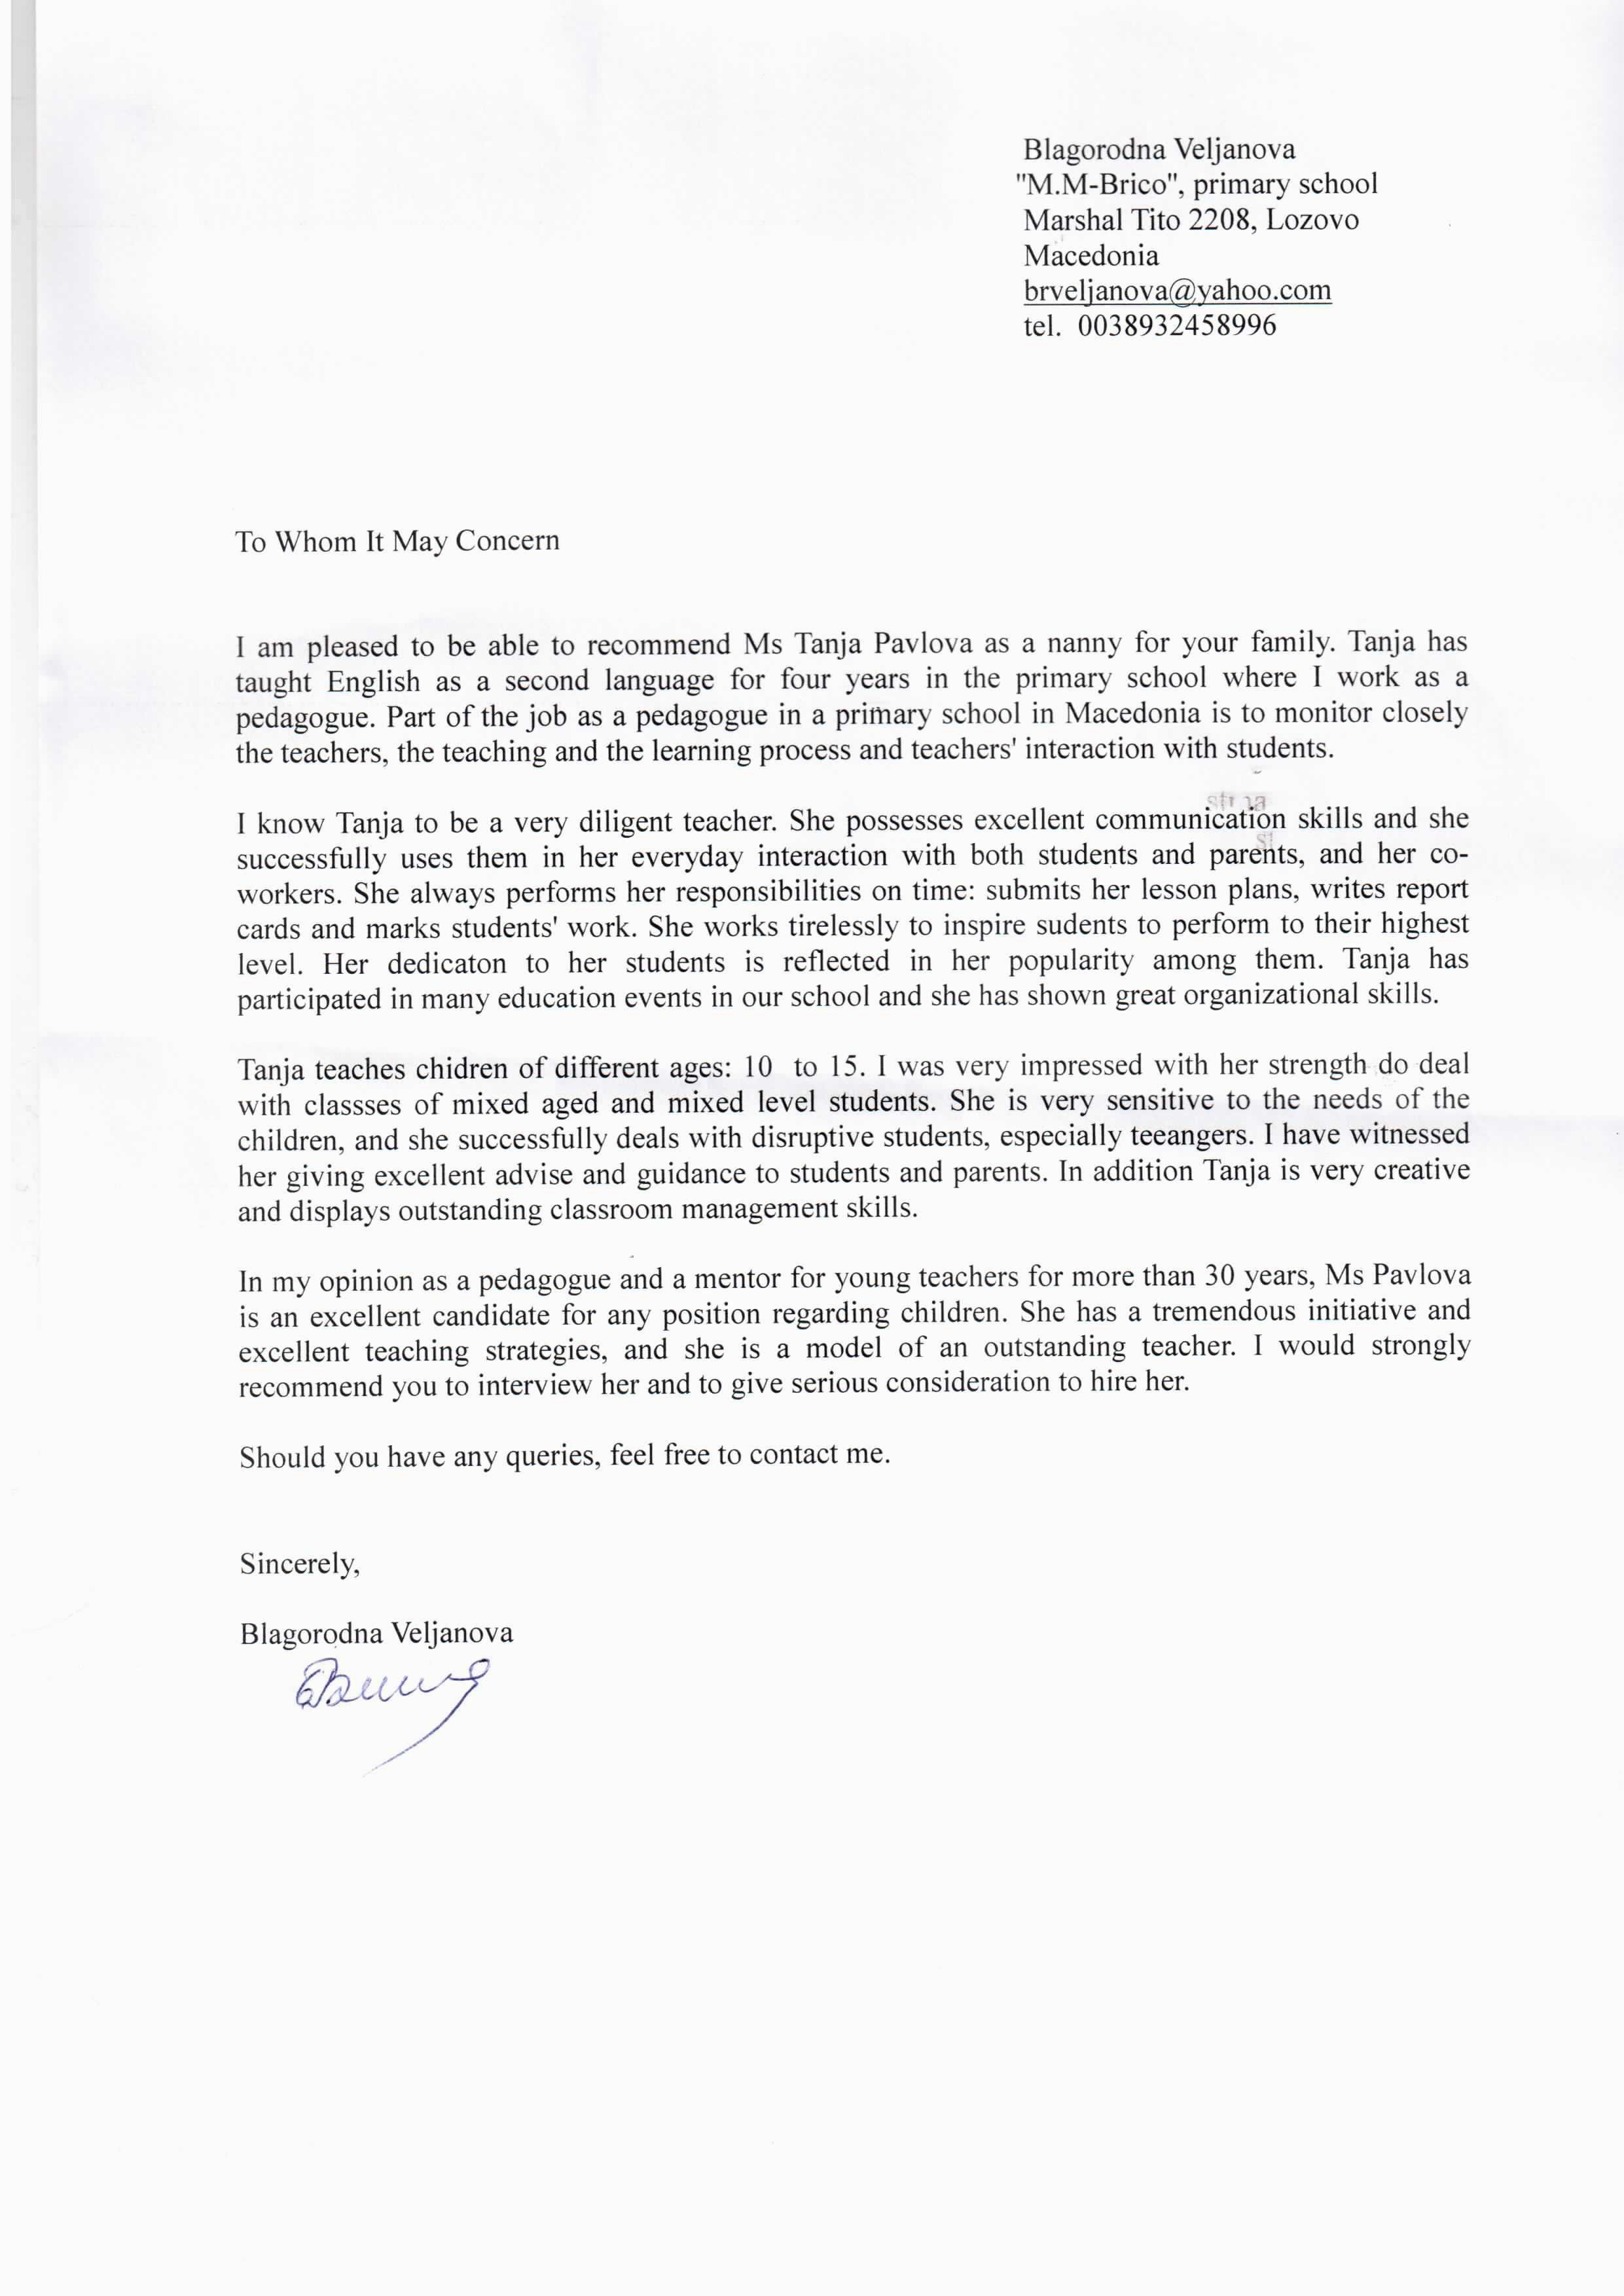 Reference Letter for Nanny Cover Letter Samples Cover